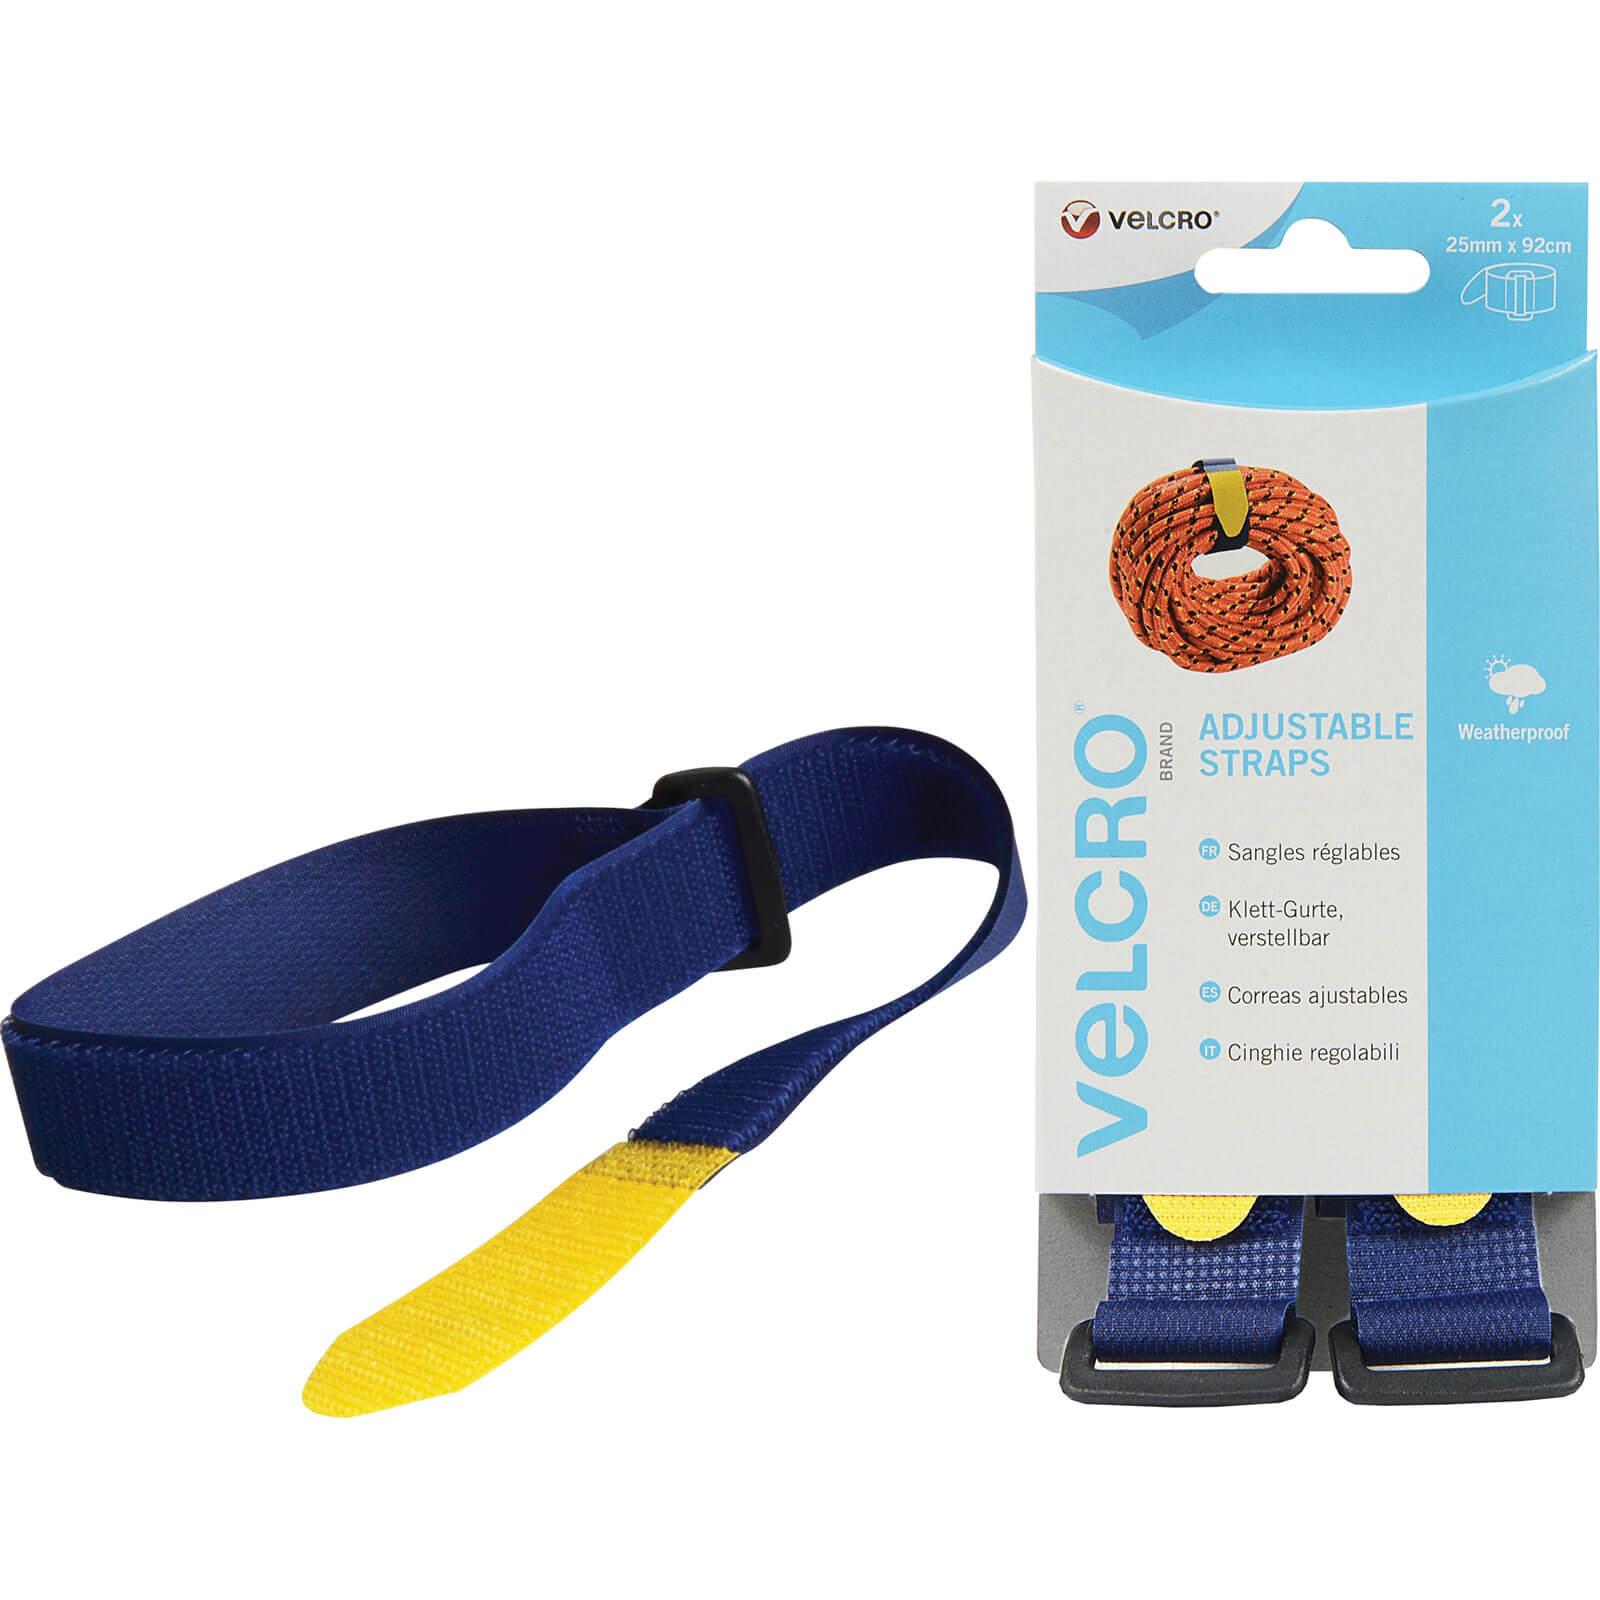 Image of Velcro Adjustable Straps Blue 25mm 920mm Pack of 2